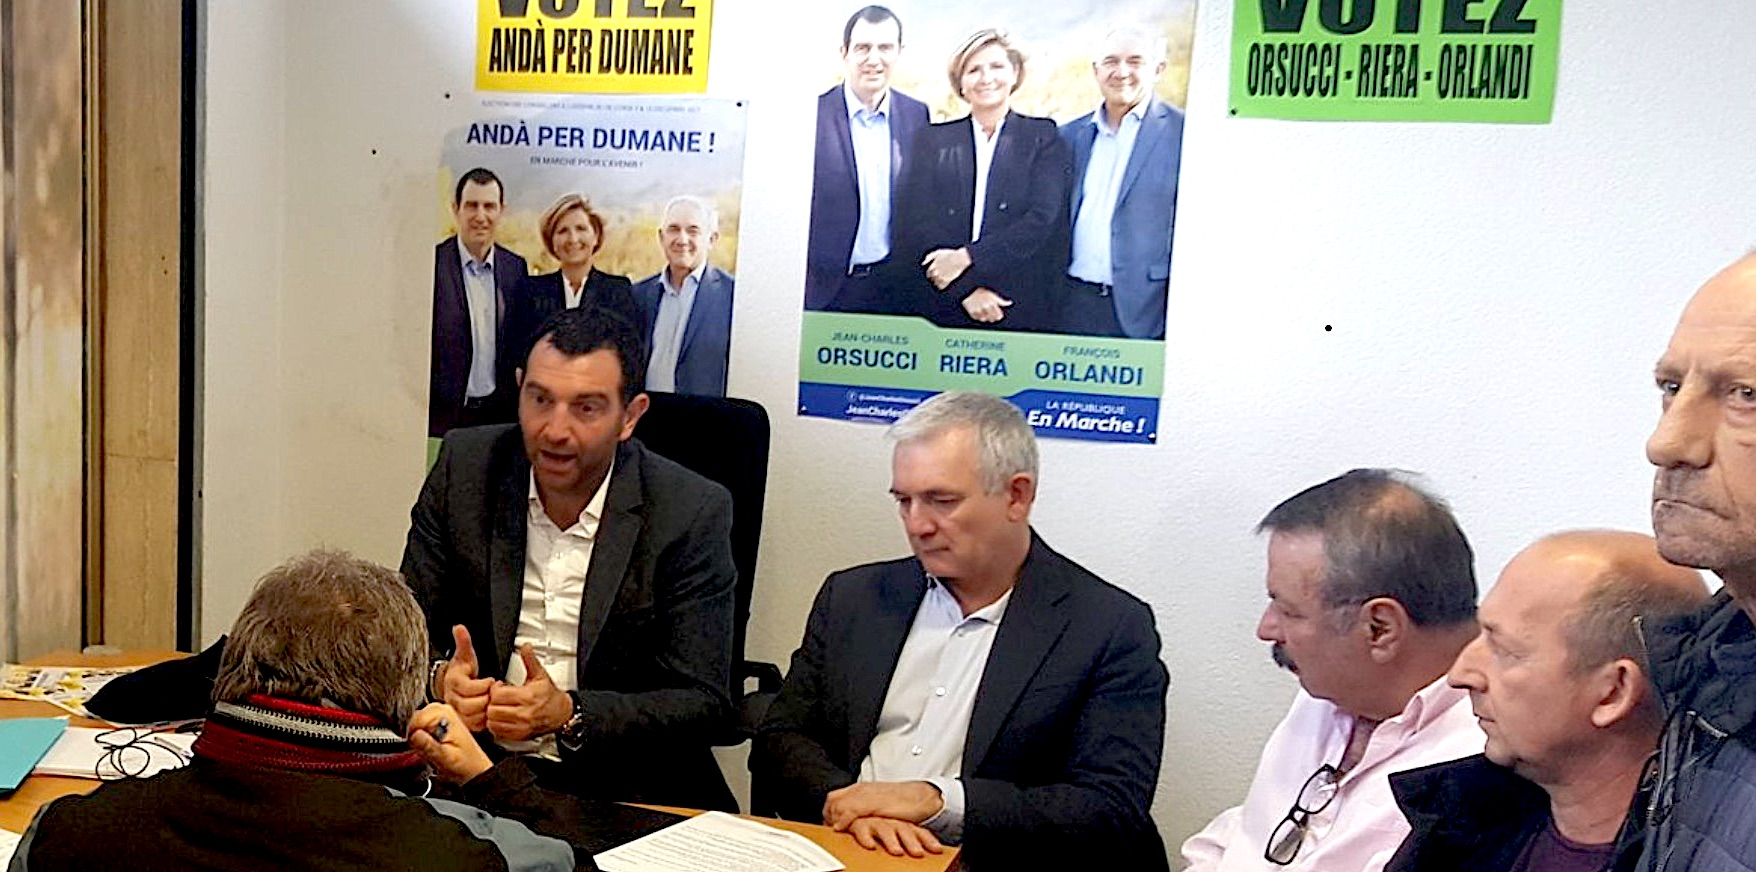 Territoriales : Le triple appel de Jean-Charles Orsucci